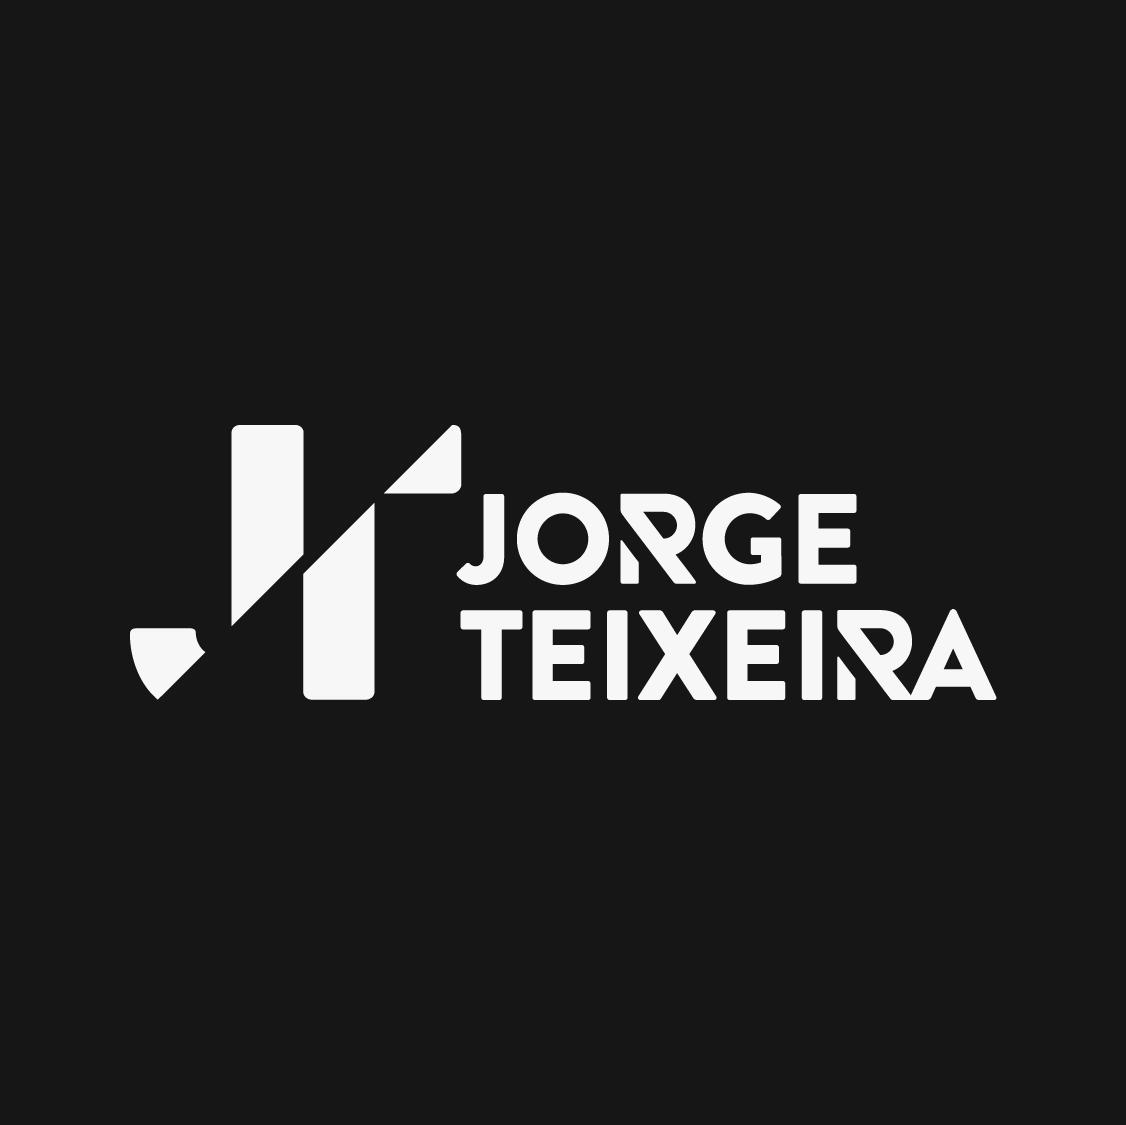 all-logos-2020-18